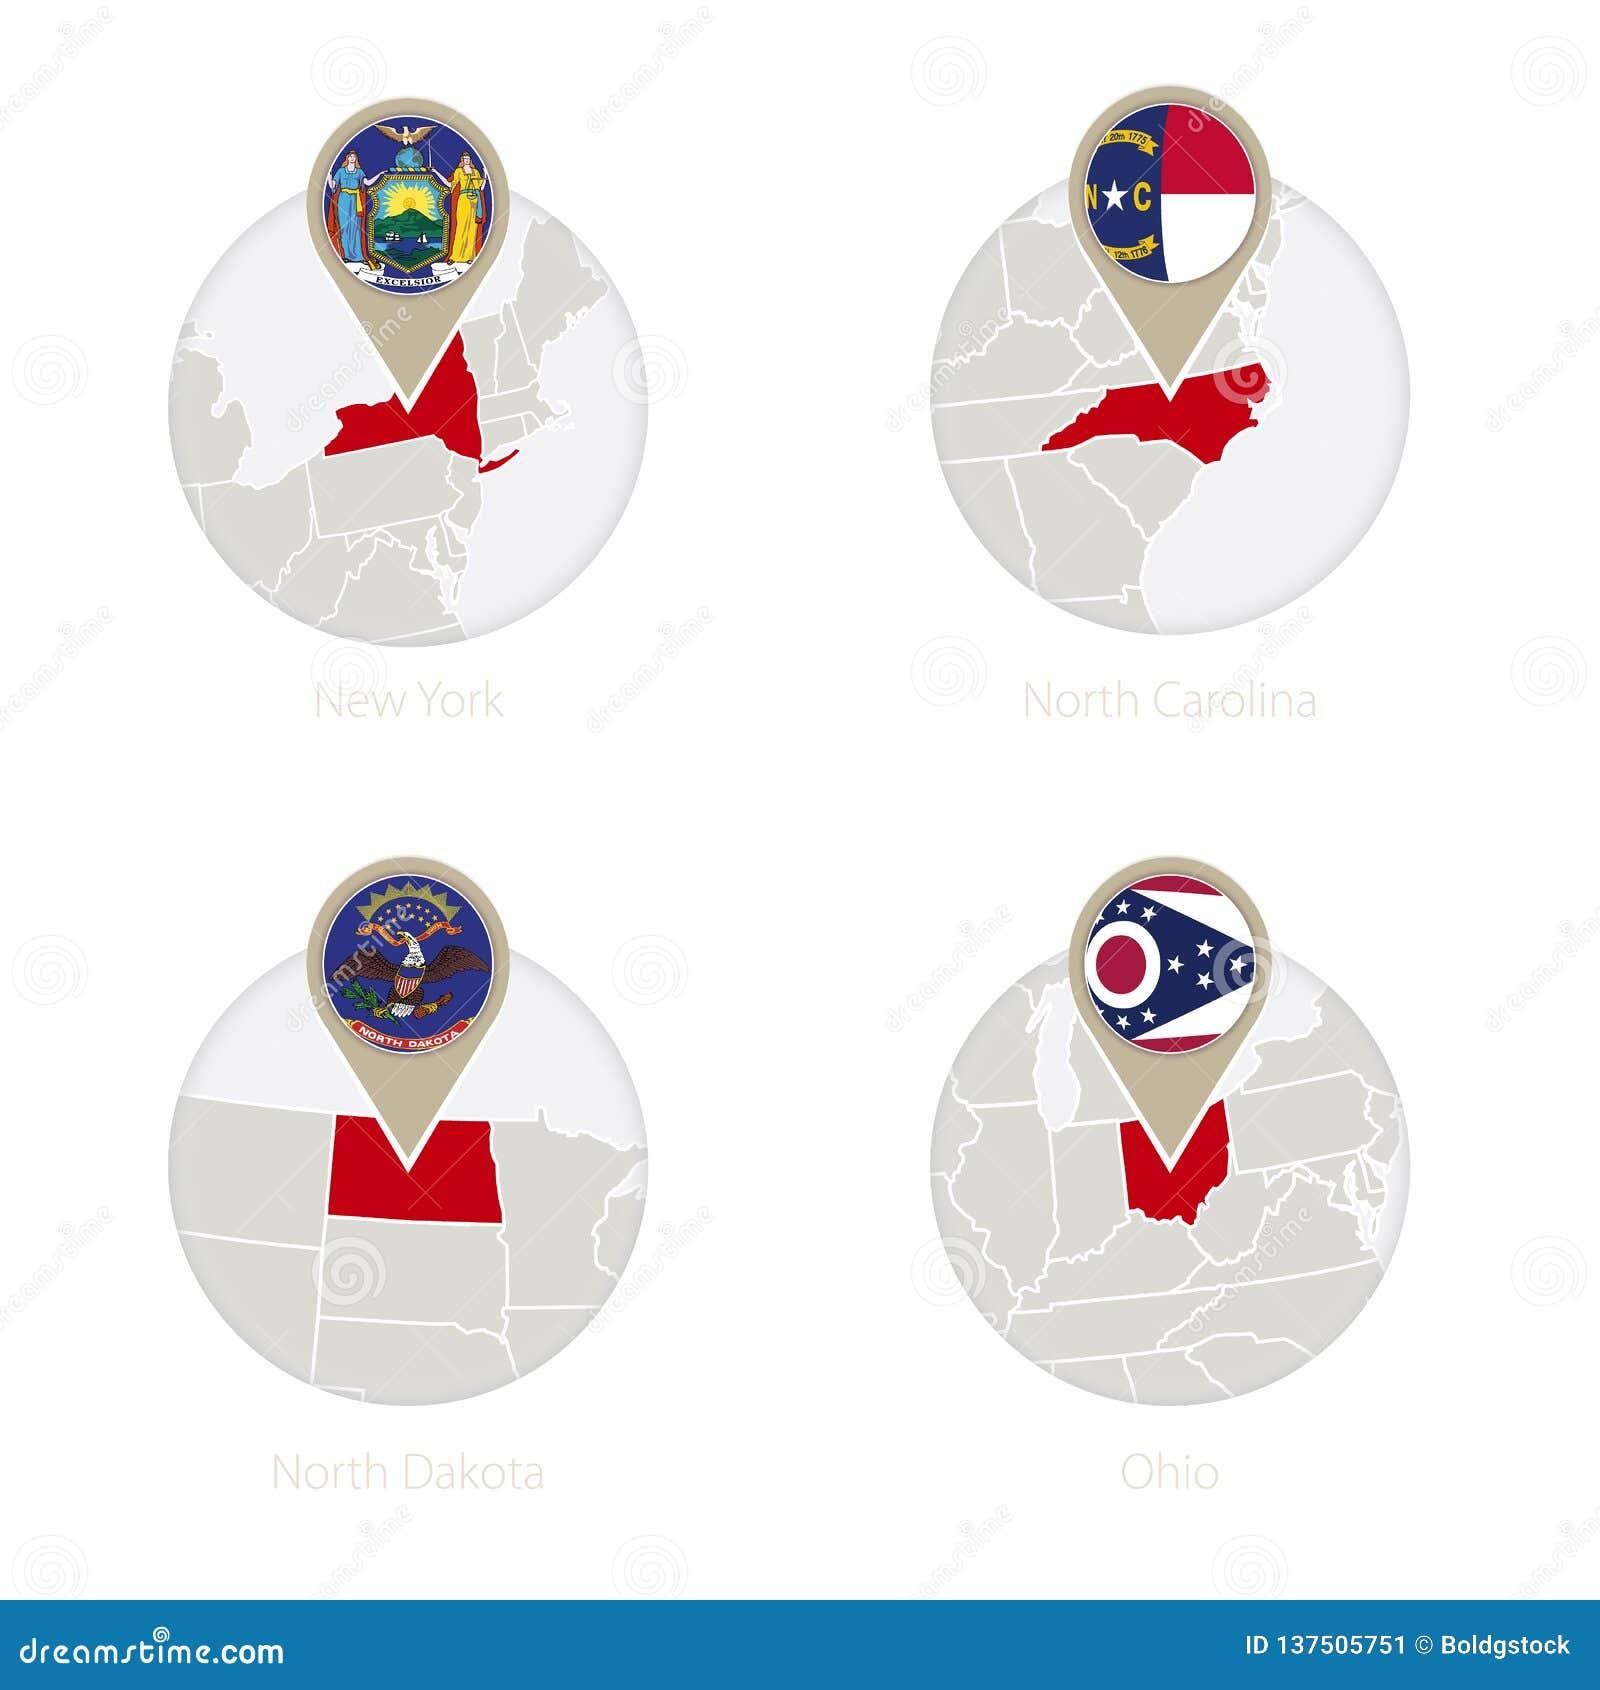 Map Of New York And Ohio.Us States New York North Carolina North Dakota Ohio Map And Flag